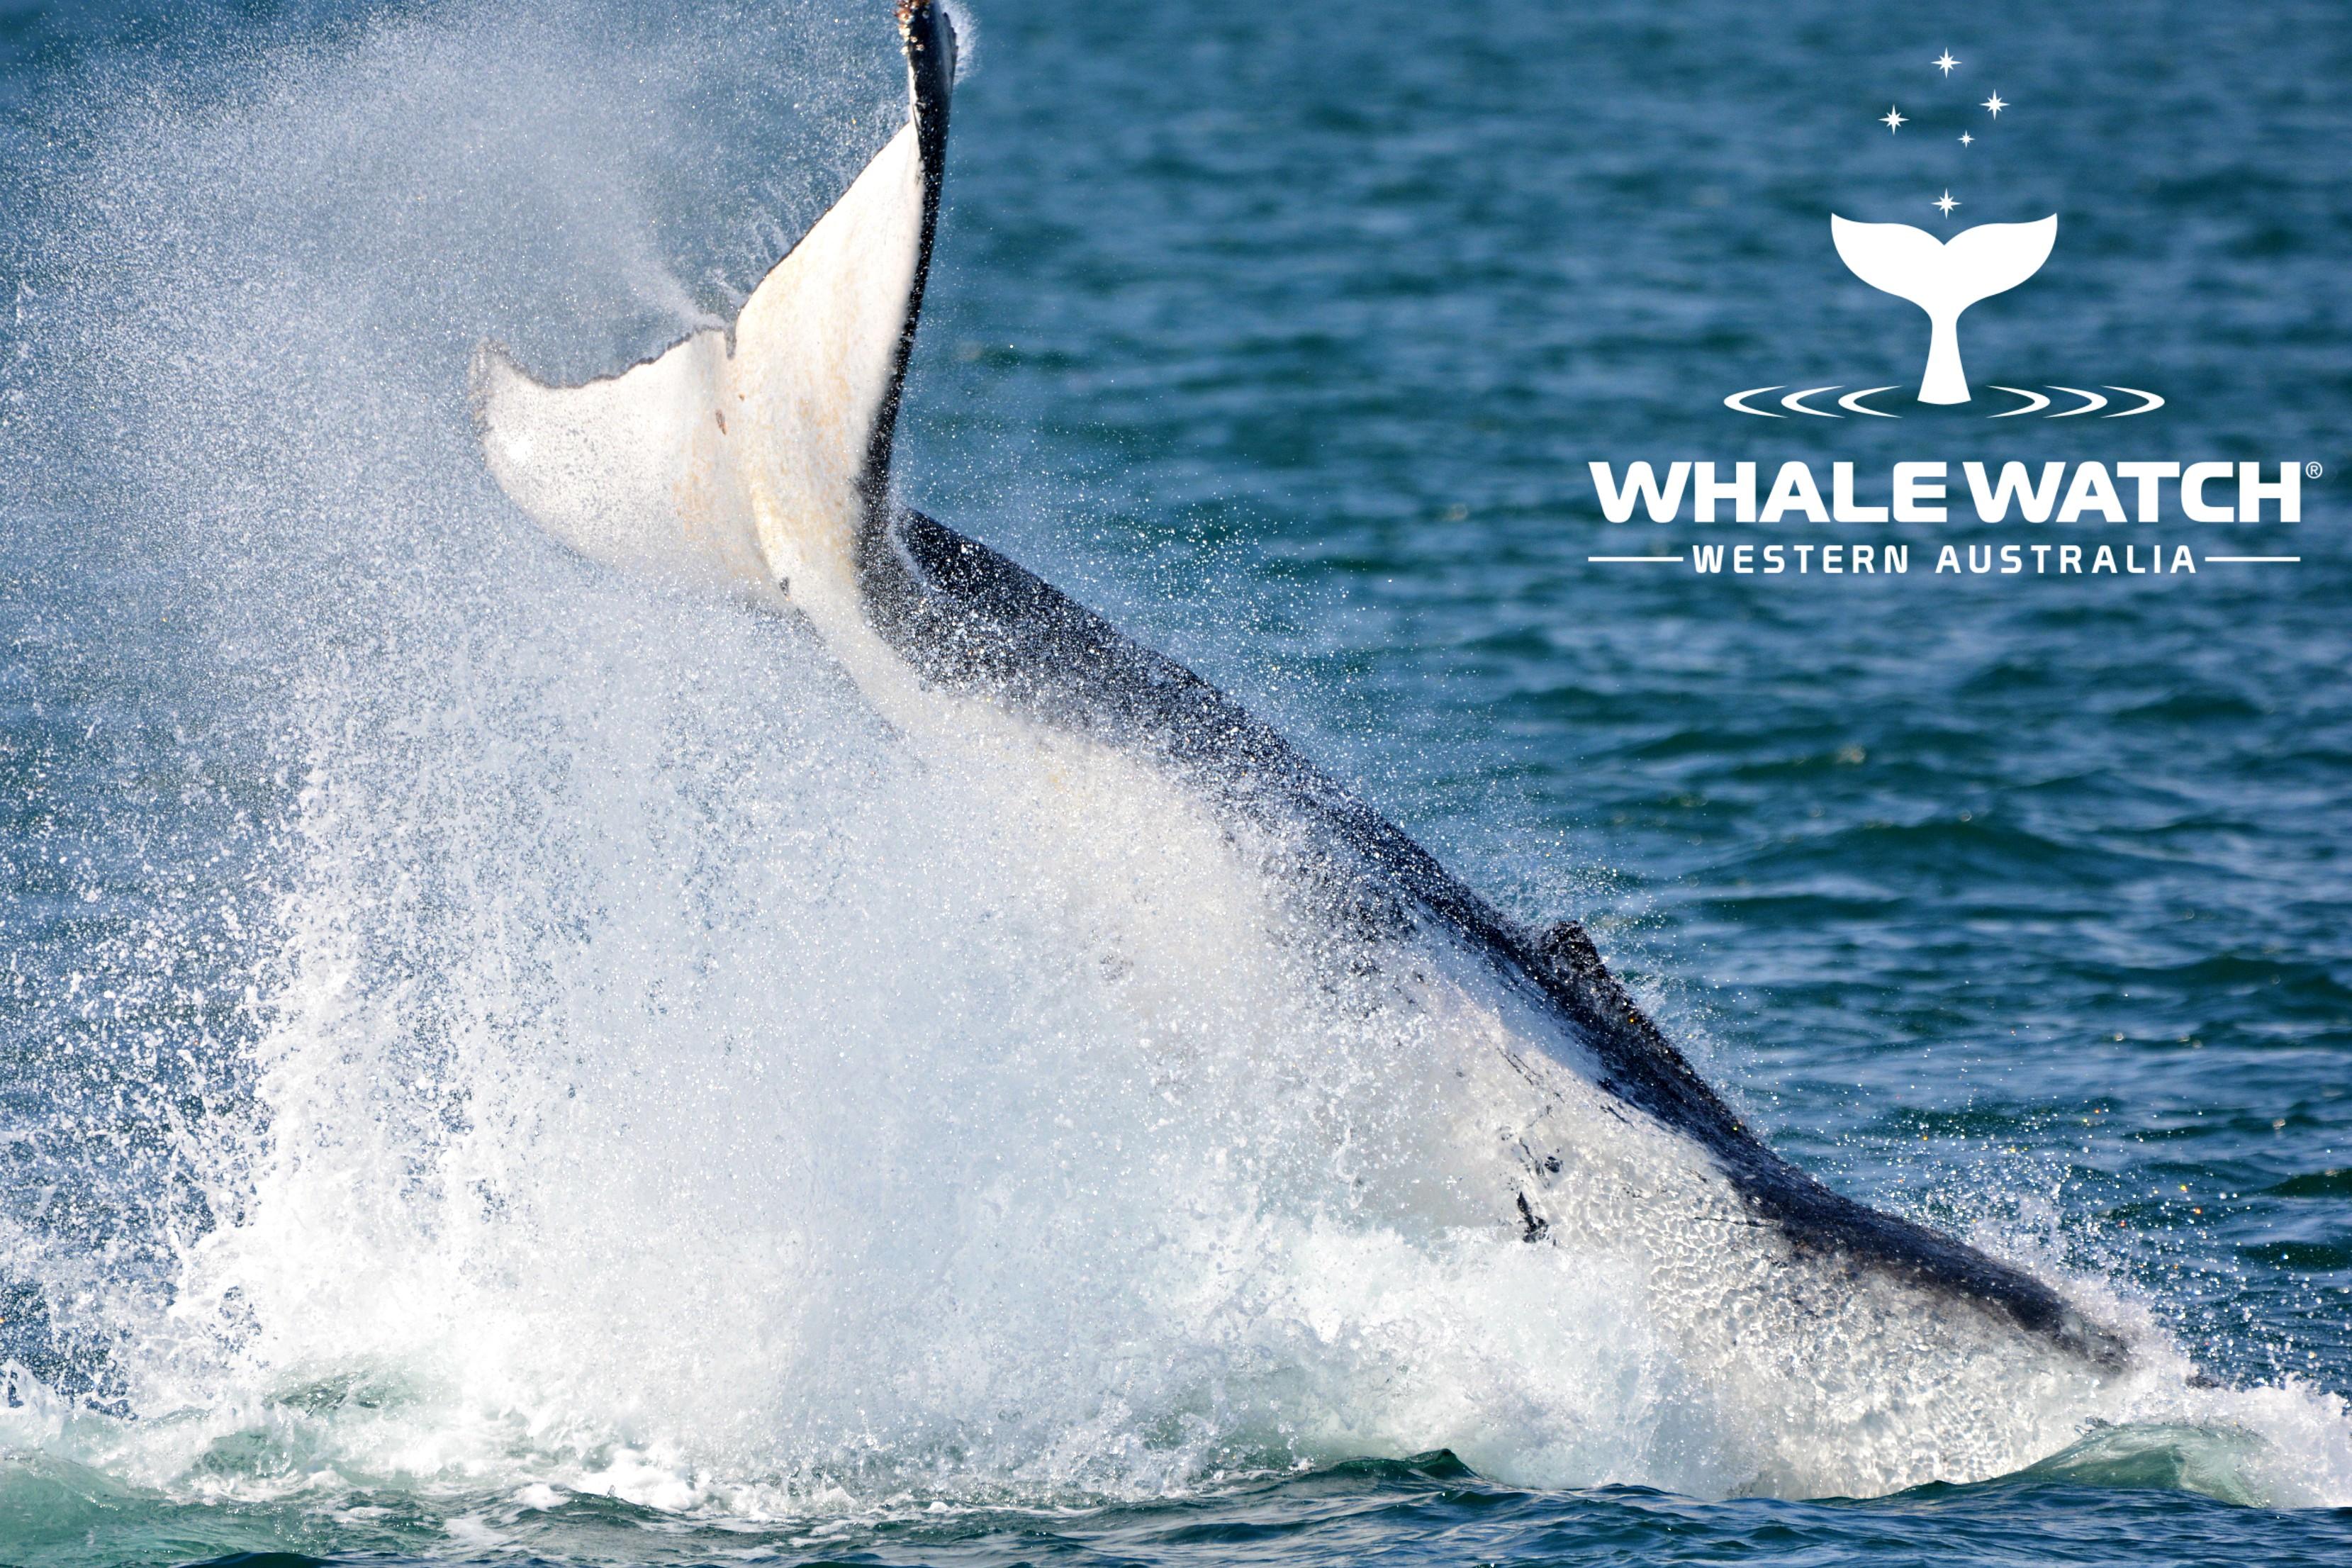 Sardine Jetty Whale Watching, Fremantle – 27/9/18